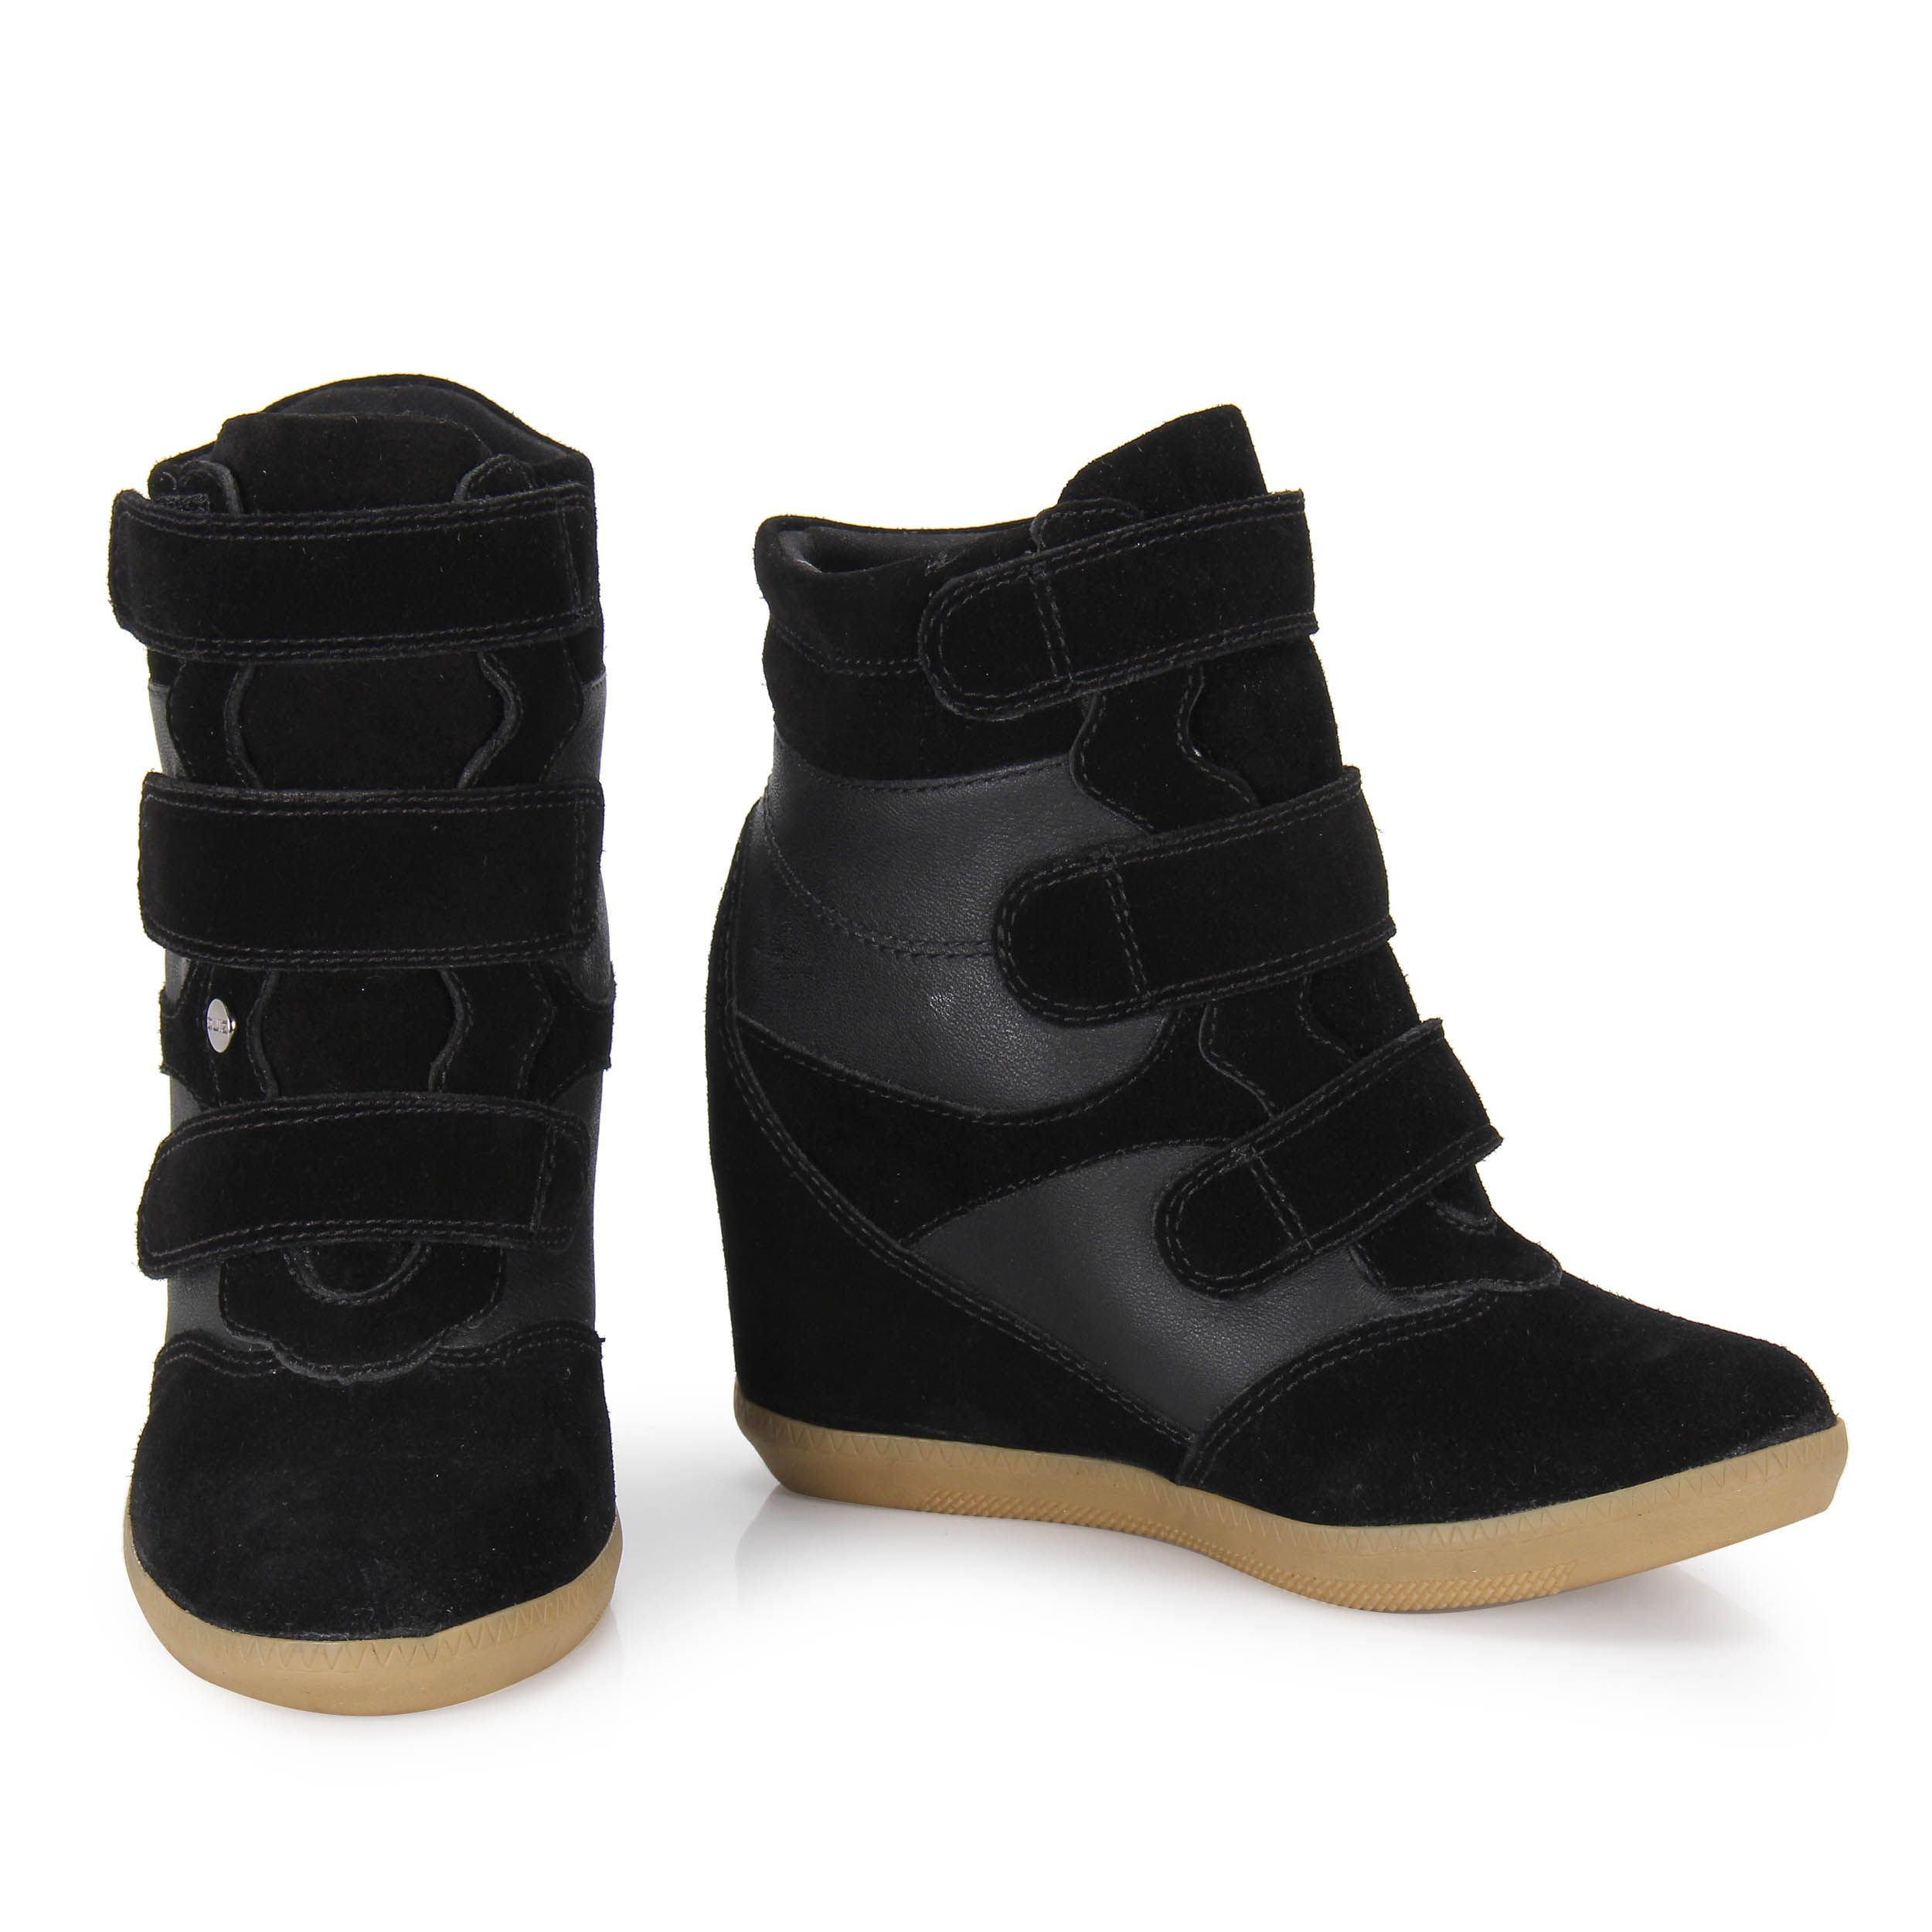 d5644cfc826 Tênis Sneaker Feminino Preto